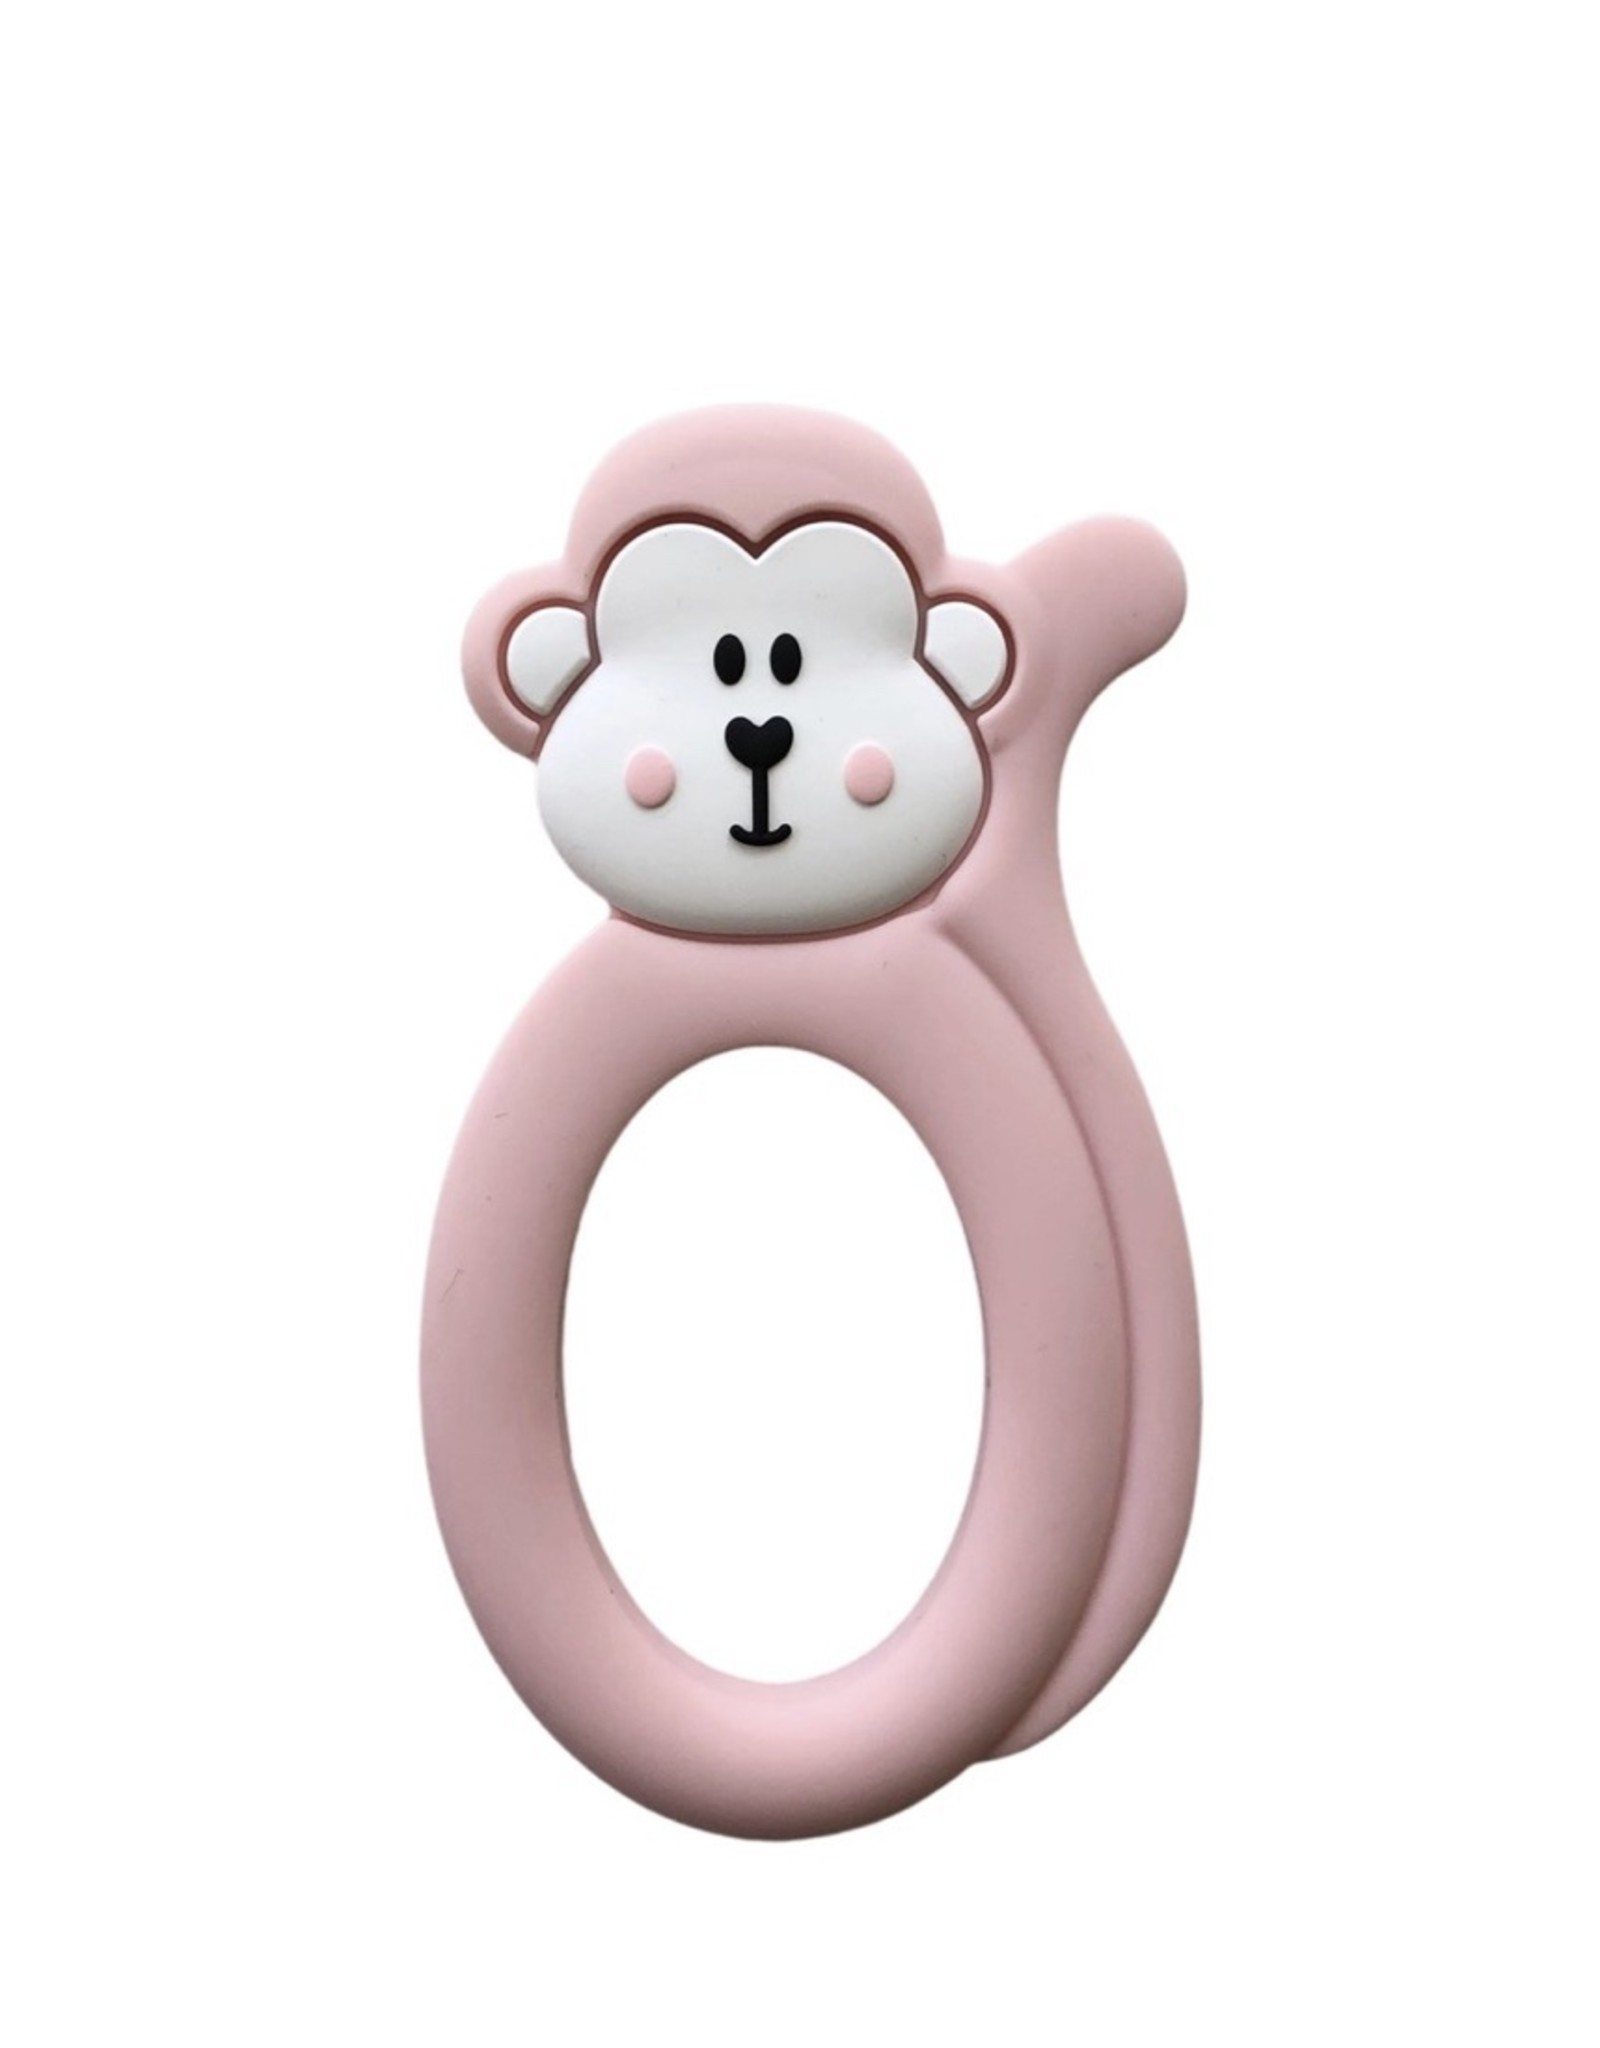 LITTLE CHEEKS Pink Monkey SILICONE TEETHER